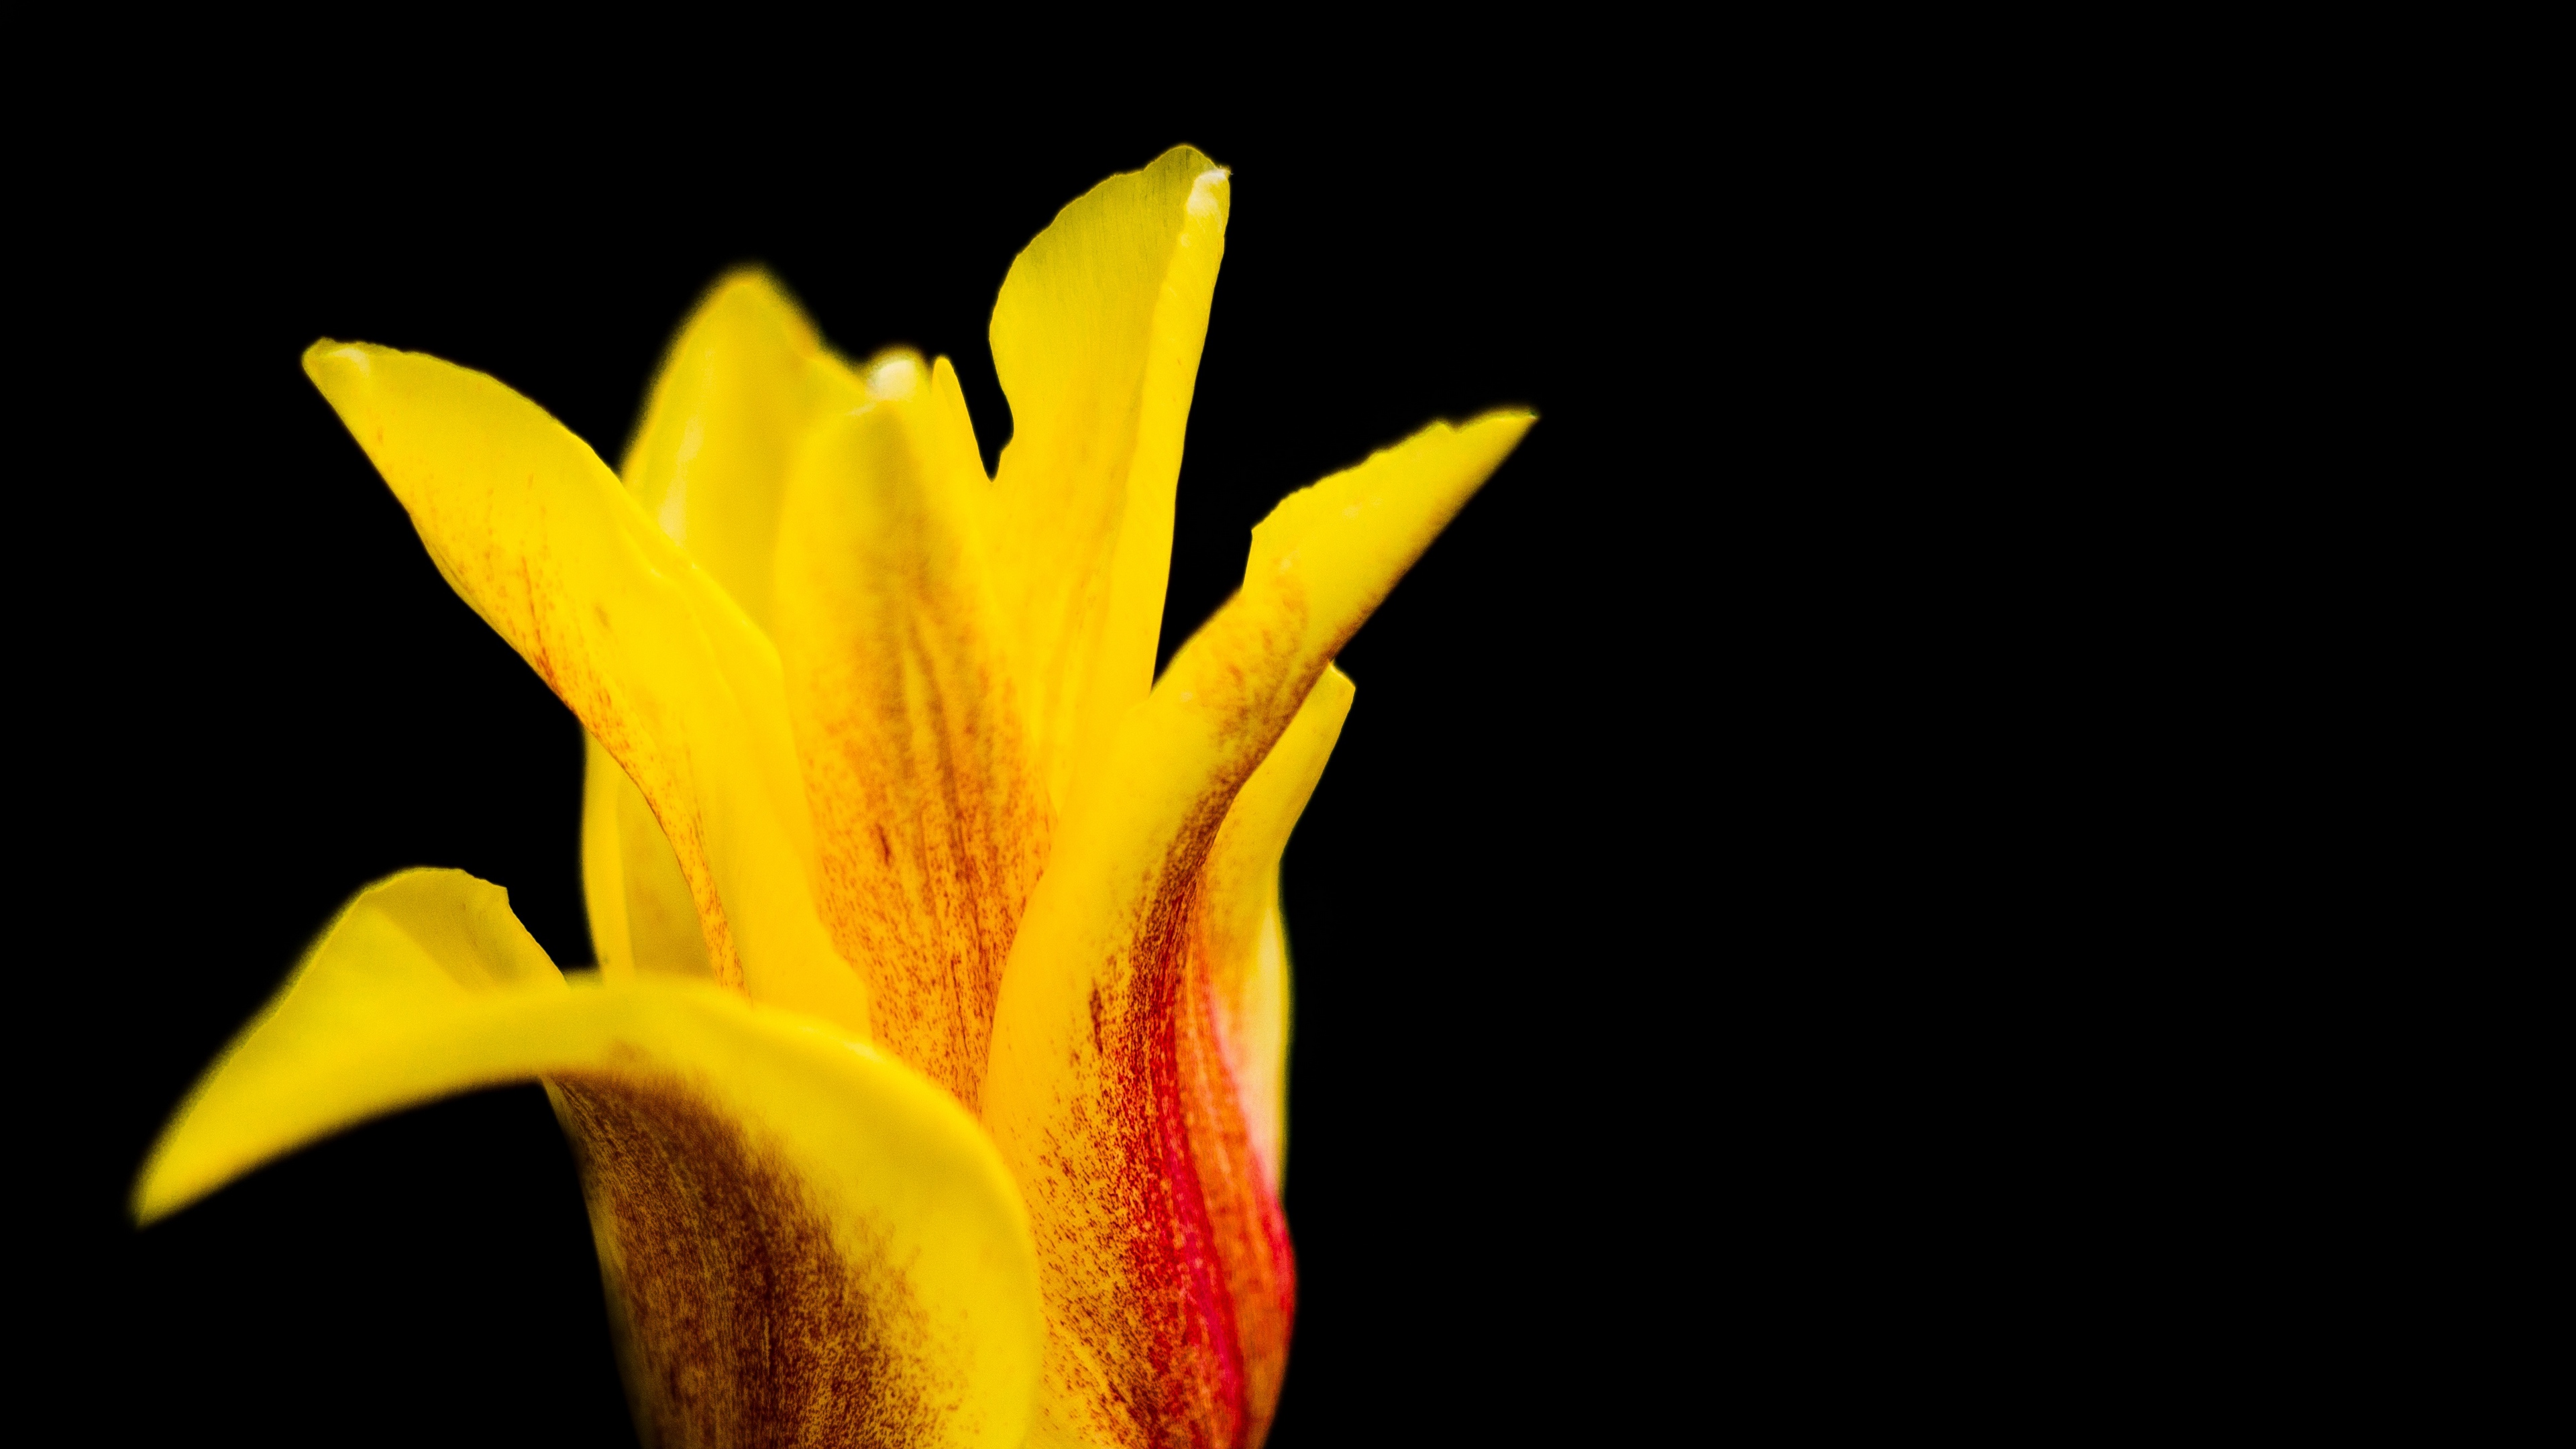 tulip flower bud petals 4k 1540064723 - tulip, flower, bud, petals 4k - Tulip, flower, bud